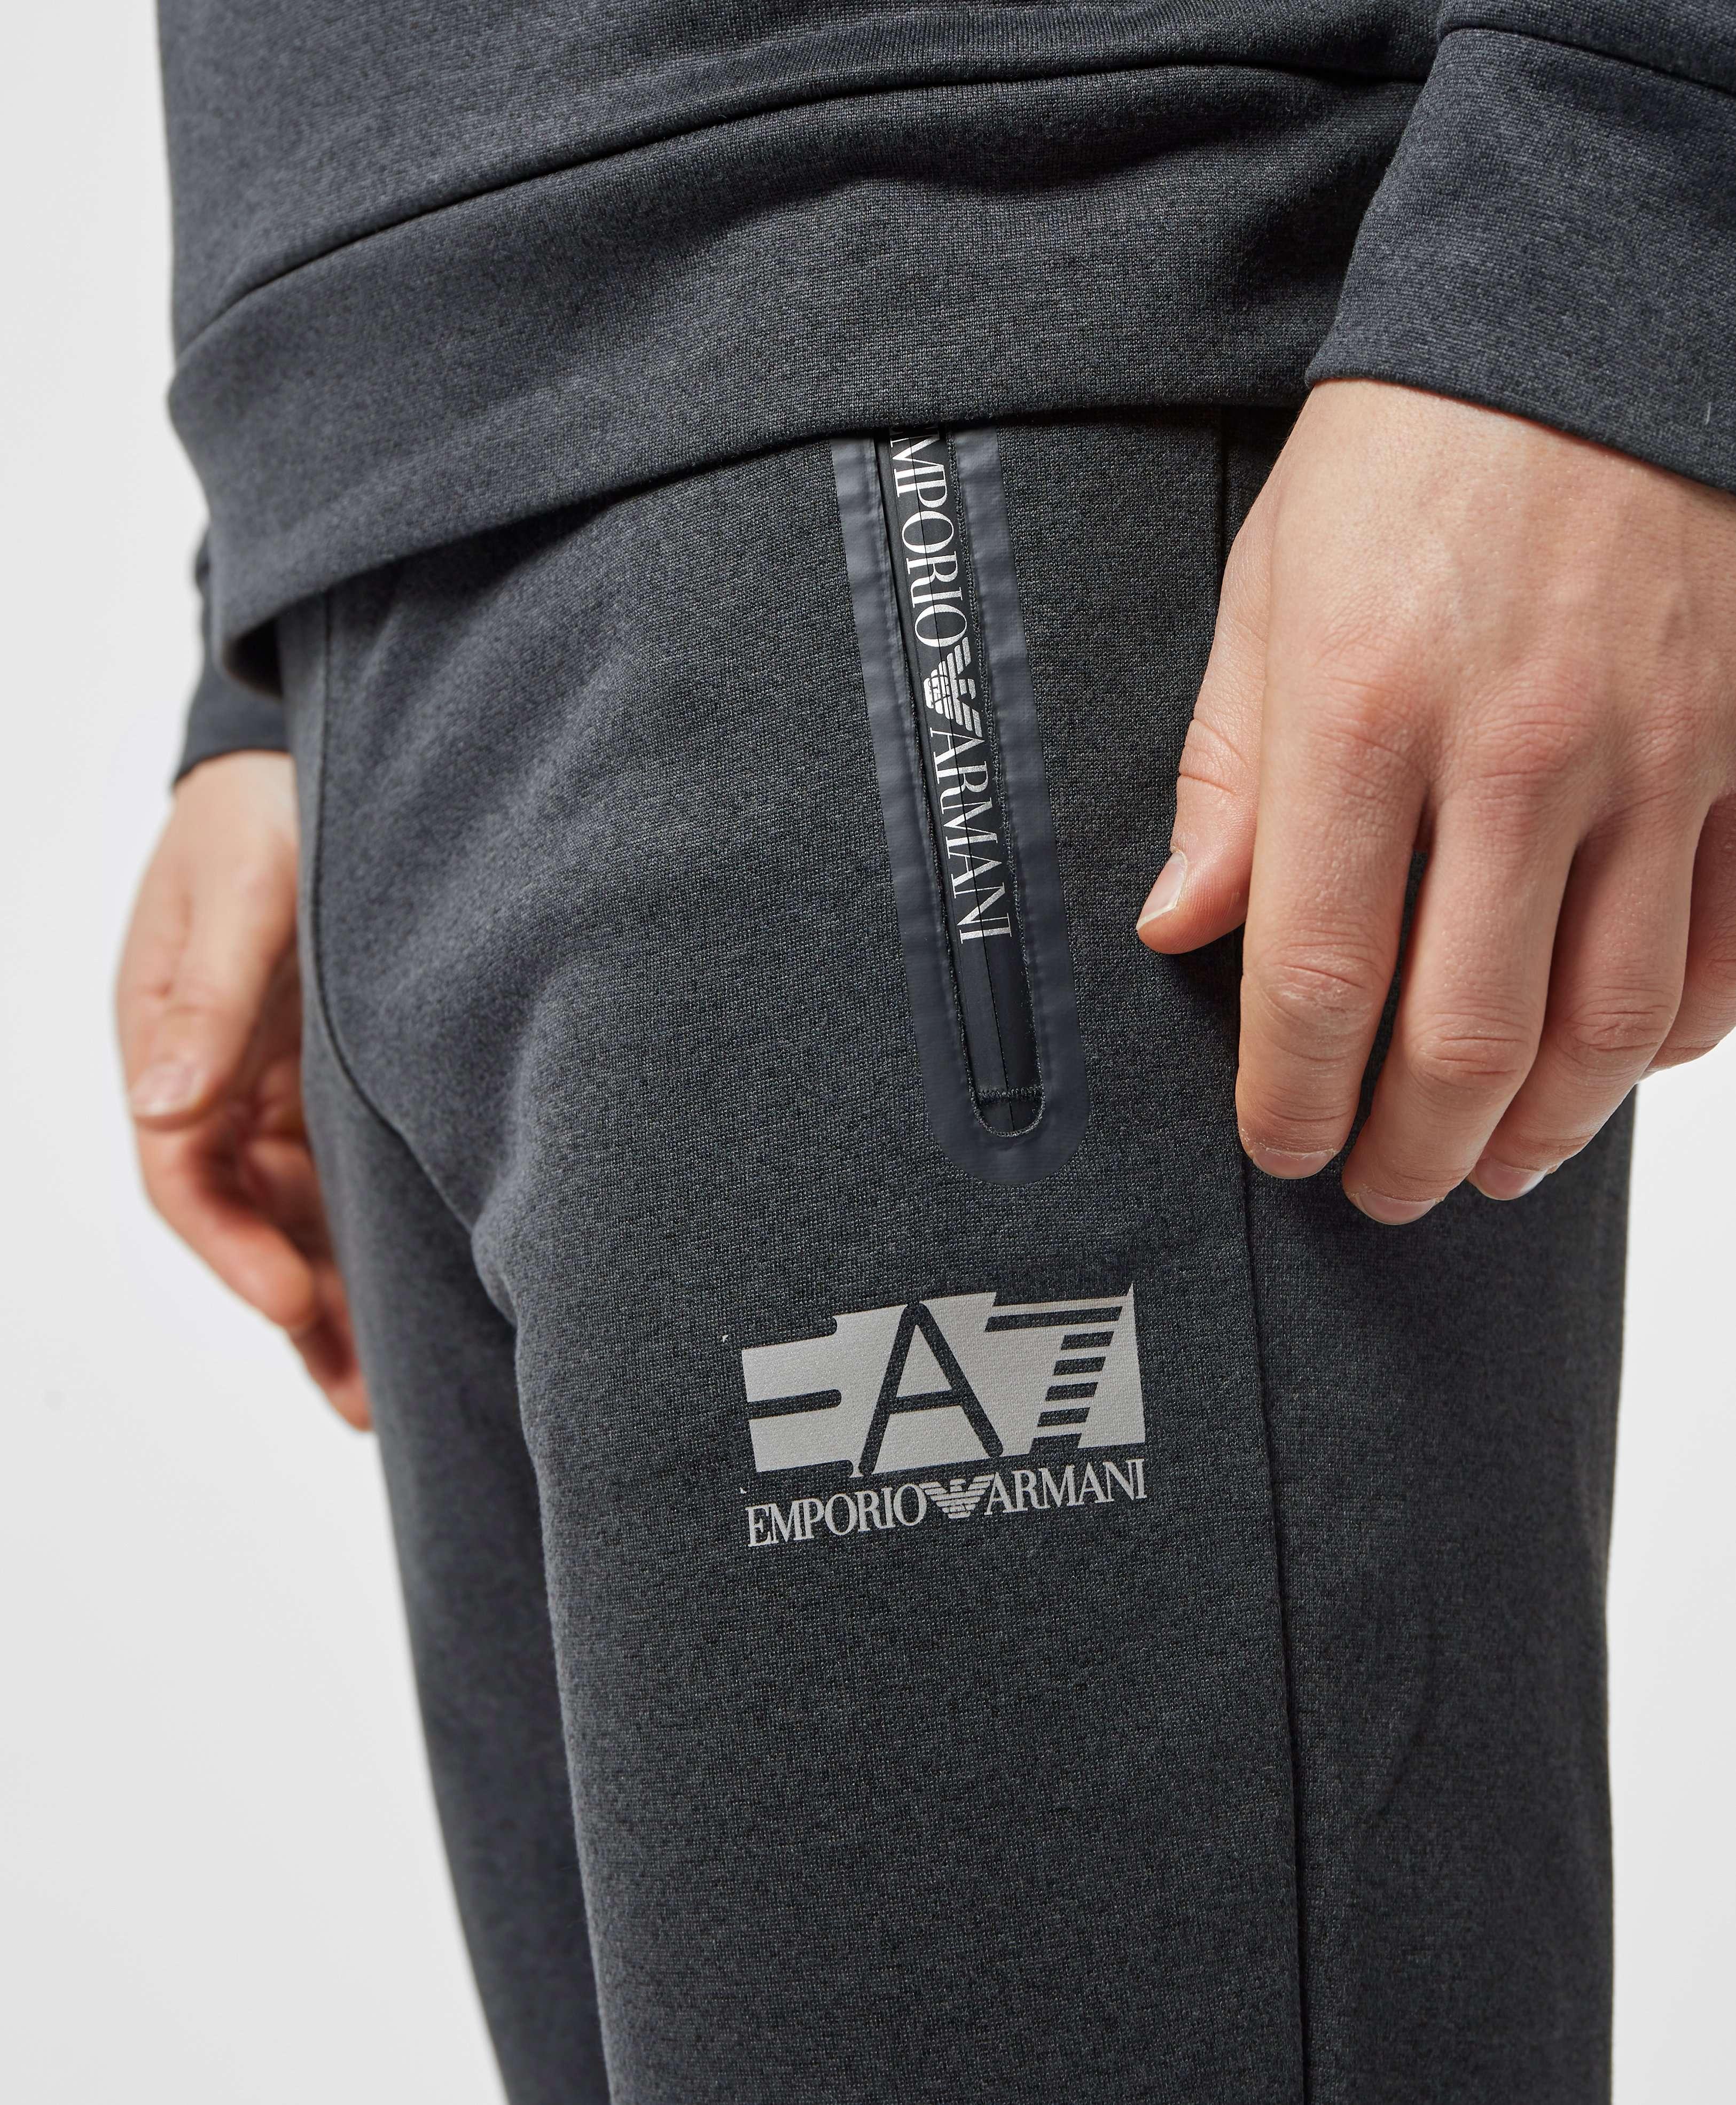 Emporio Armani EA7 Tech Cuffed Fleece Pants - Exclusive